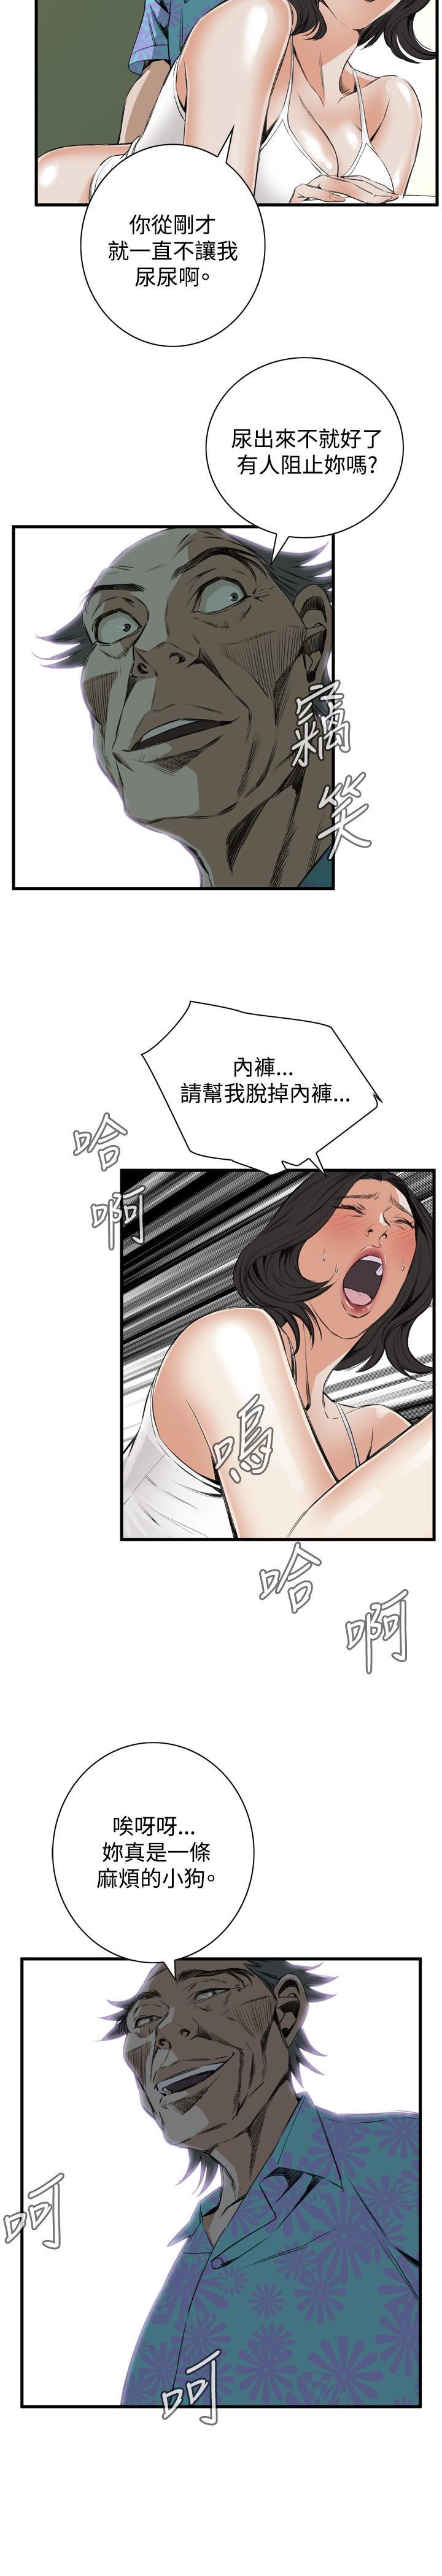 Take a Peek 偷窥 Ch.39~51 [Chinese]中文 271